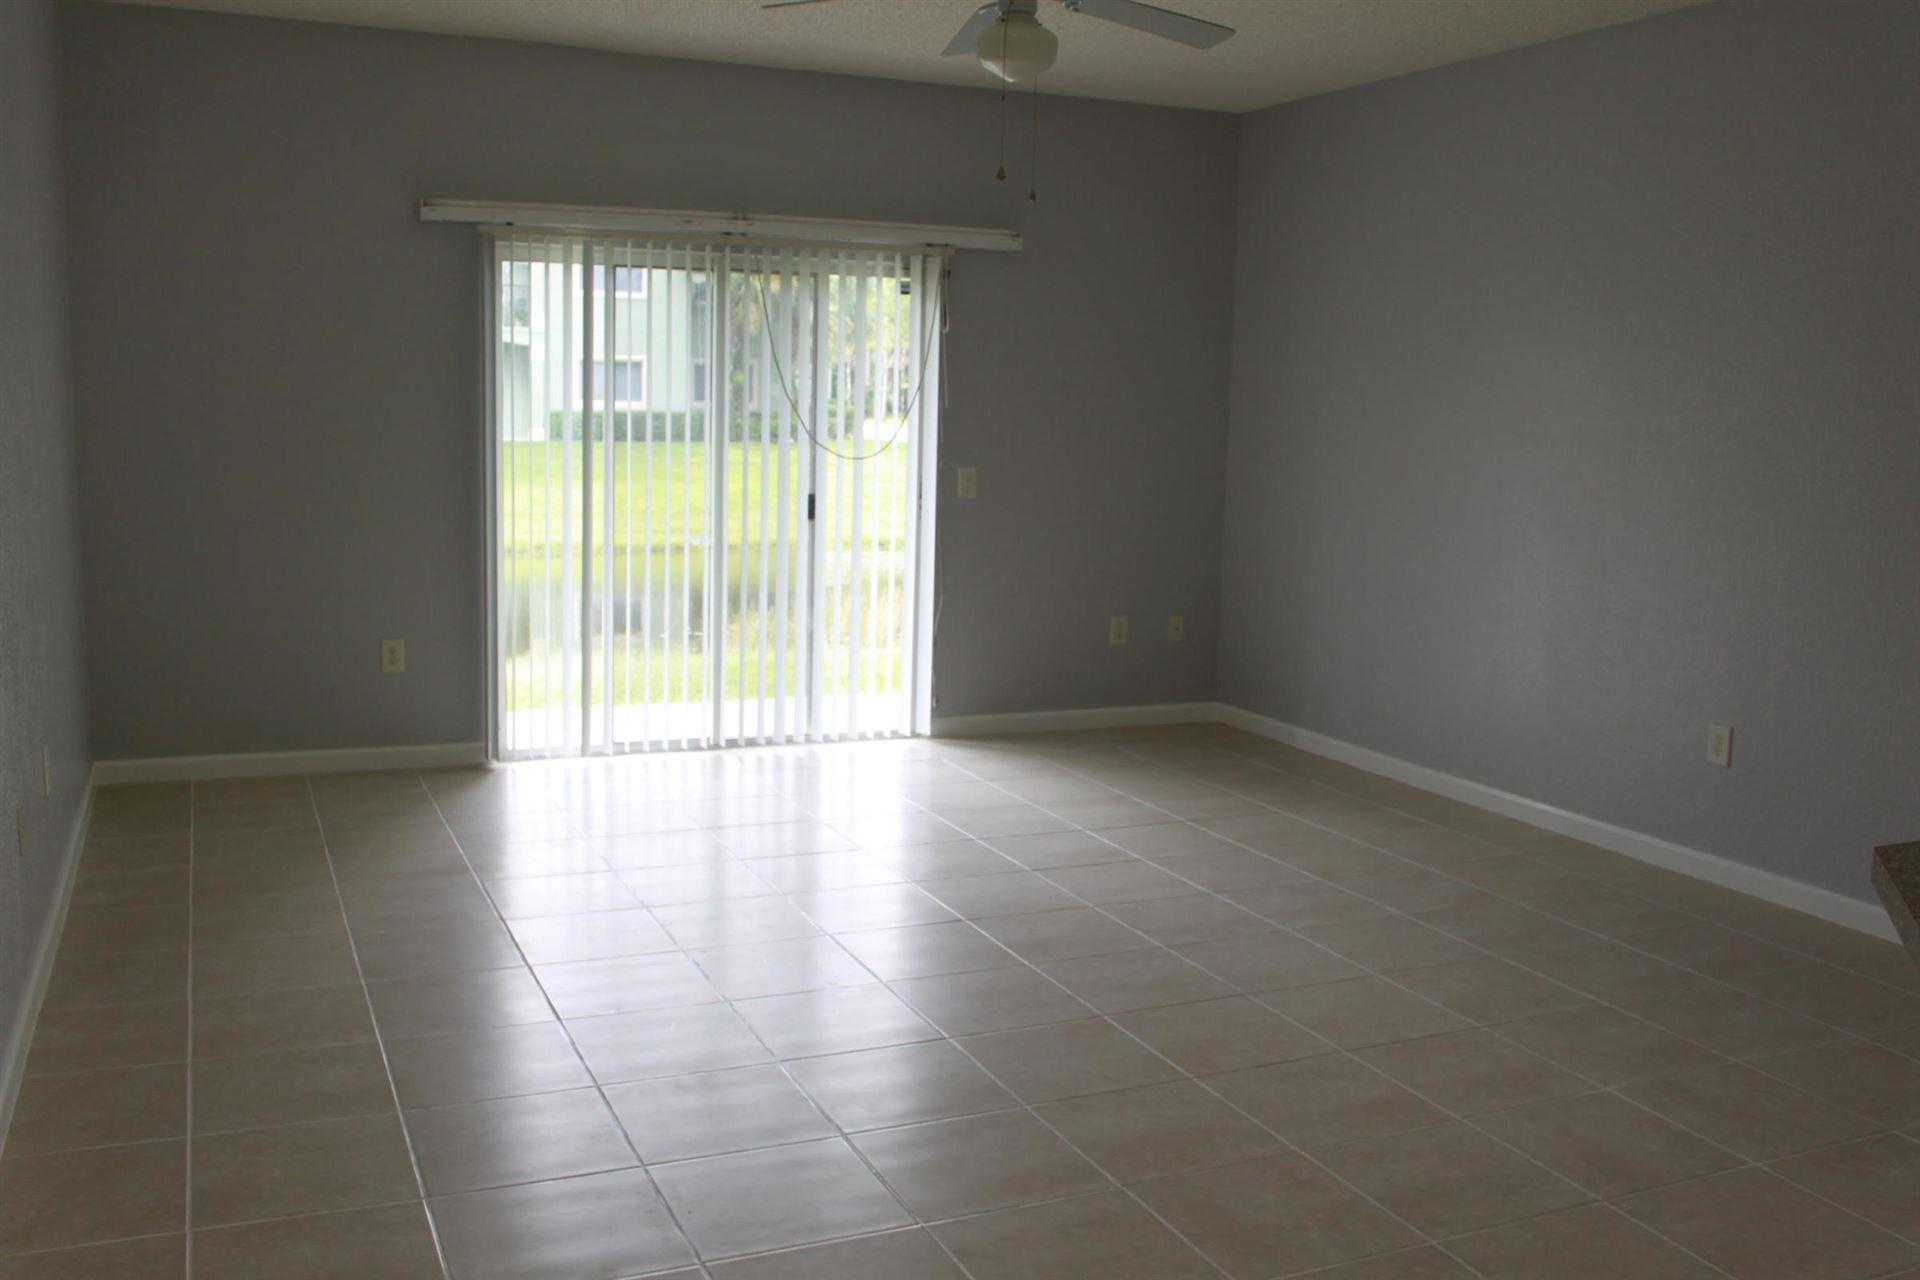 320 Crestwood Circle #103, Royal Palm Beach, FL 33411 - #: RX-10670251